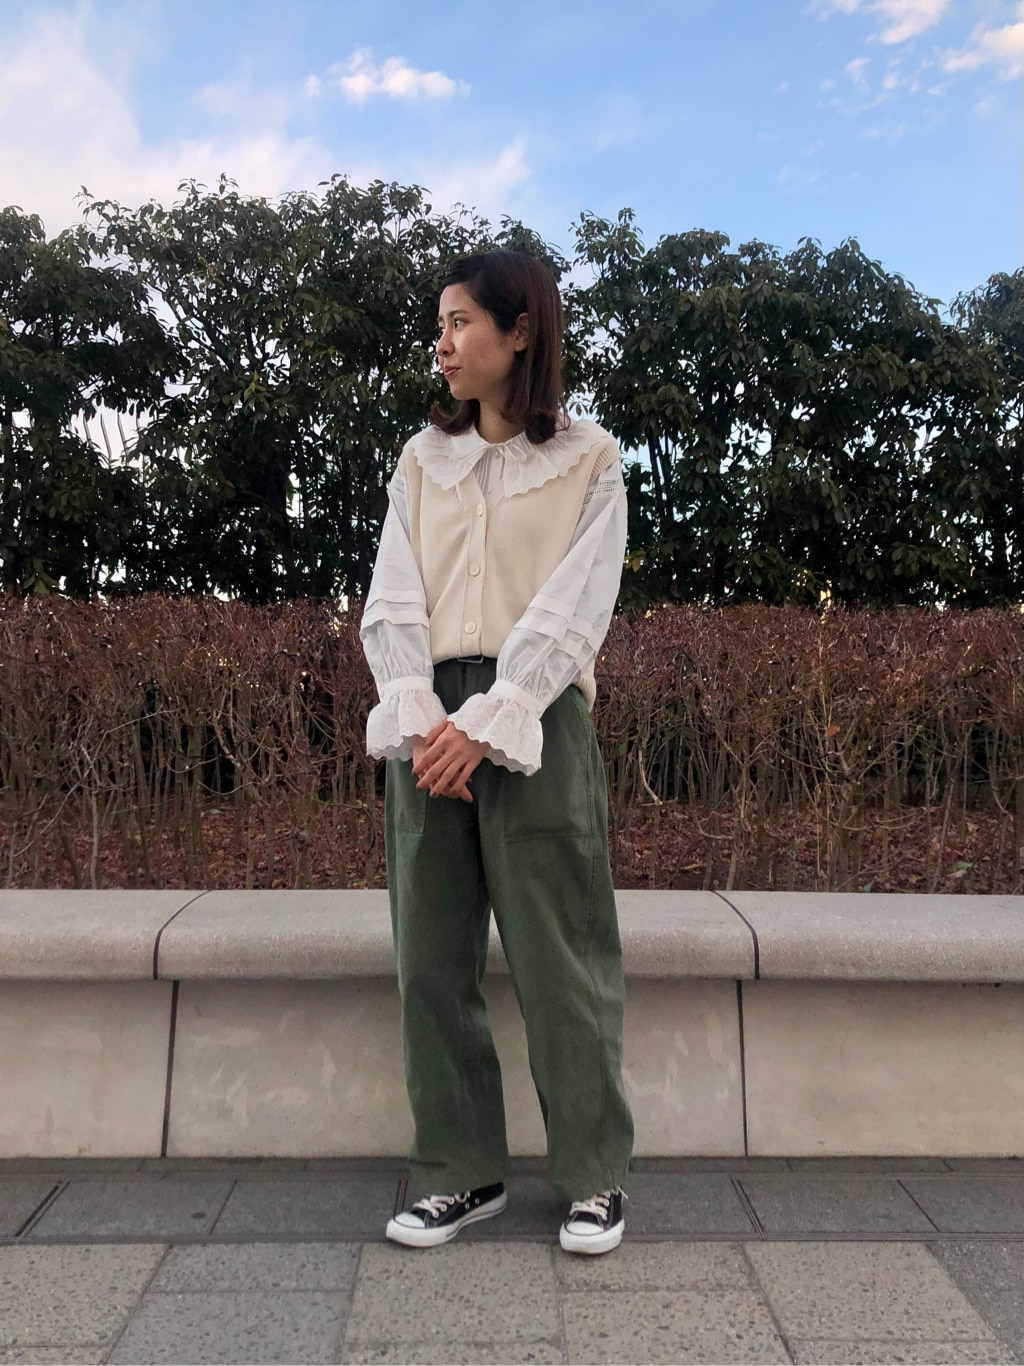 - CHILD WOMAN CHILD WOMAN , PAR ICI 東京スカイツリータウン・ソラマチ 身長:160cm 2021.01.16